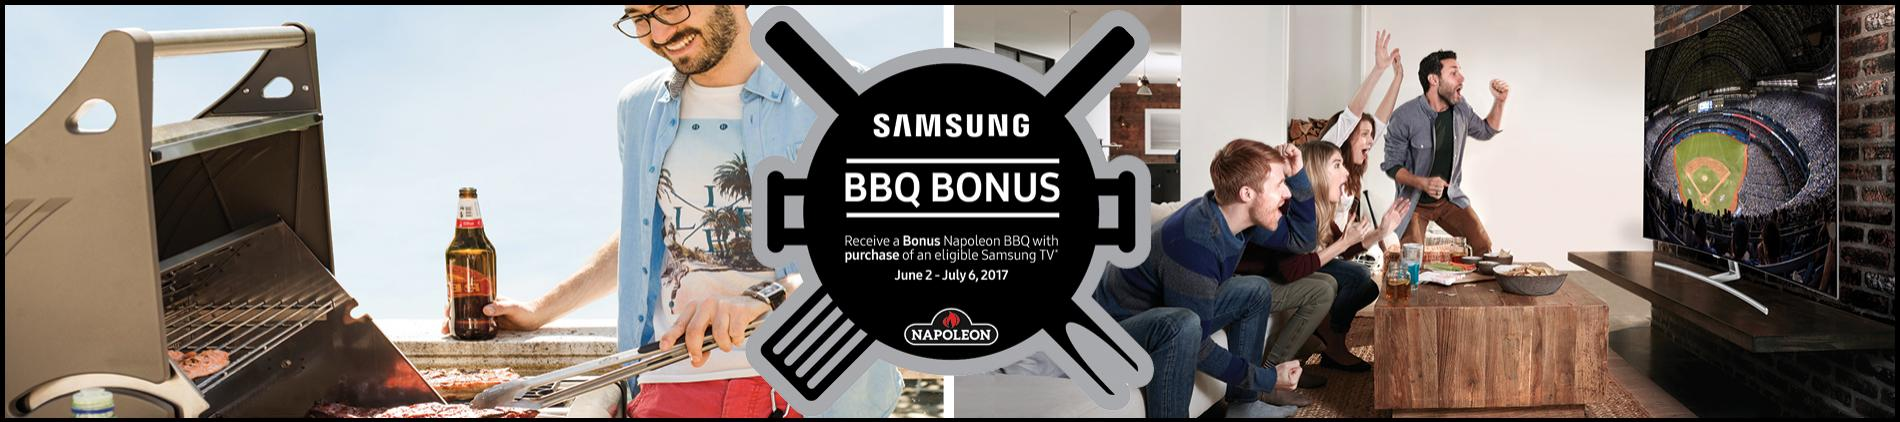 Samsung BBQ Promo